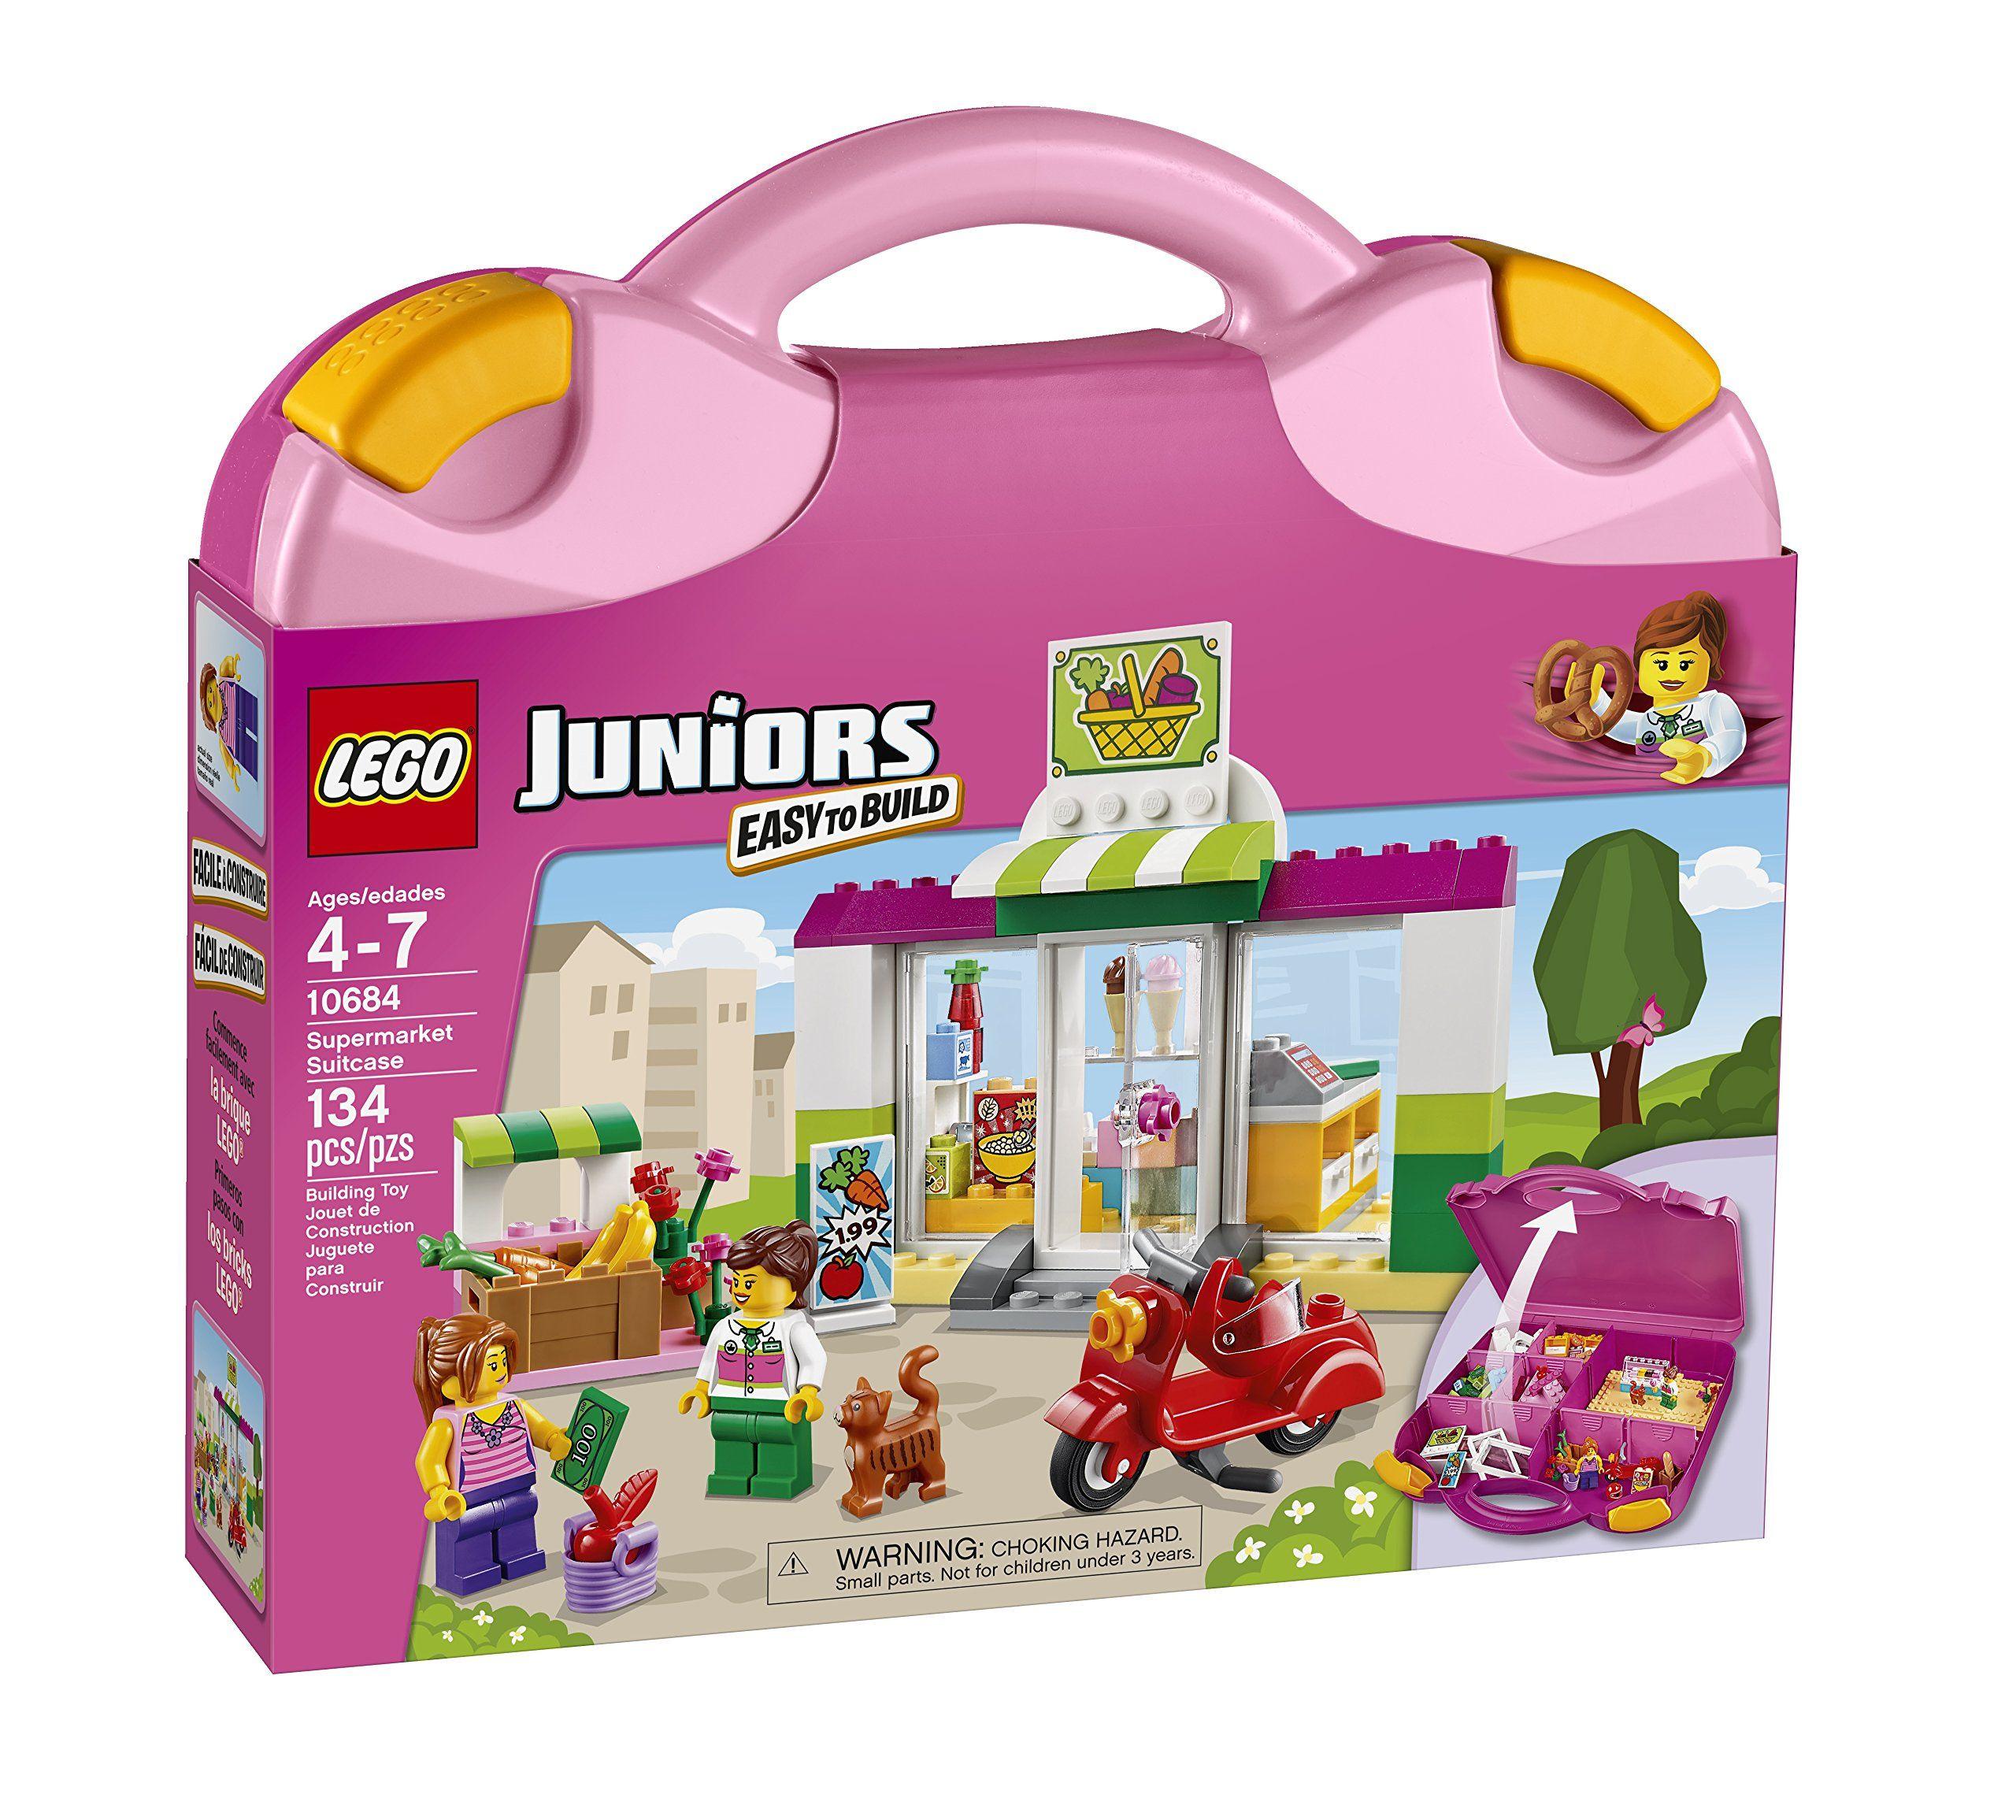 Lego Juniors Supermarket Suitcase Ruthie Asked For Girl Legos